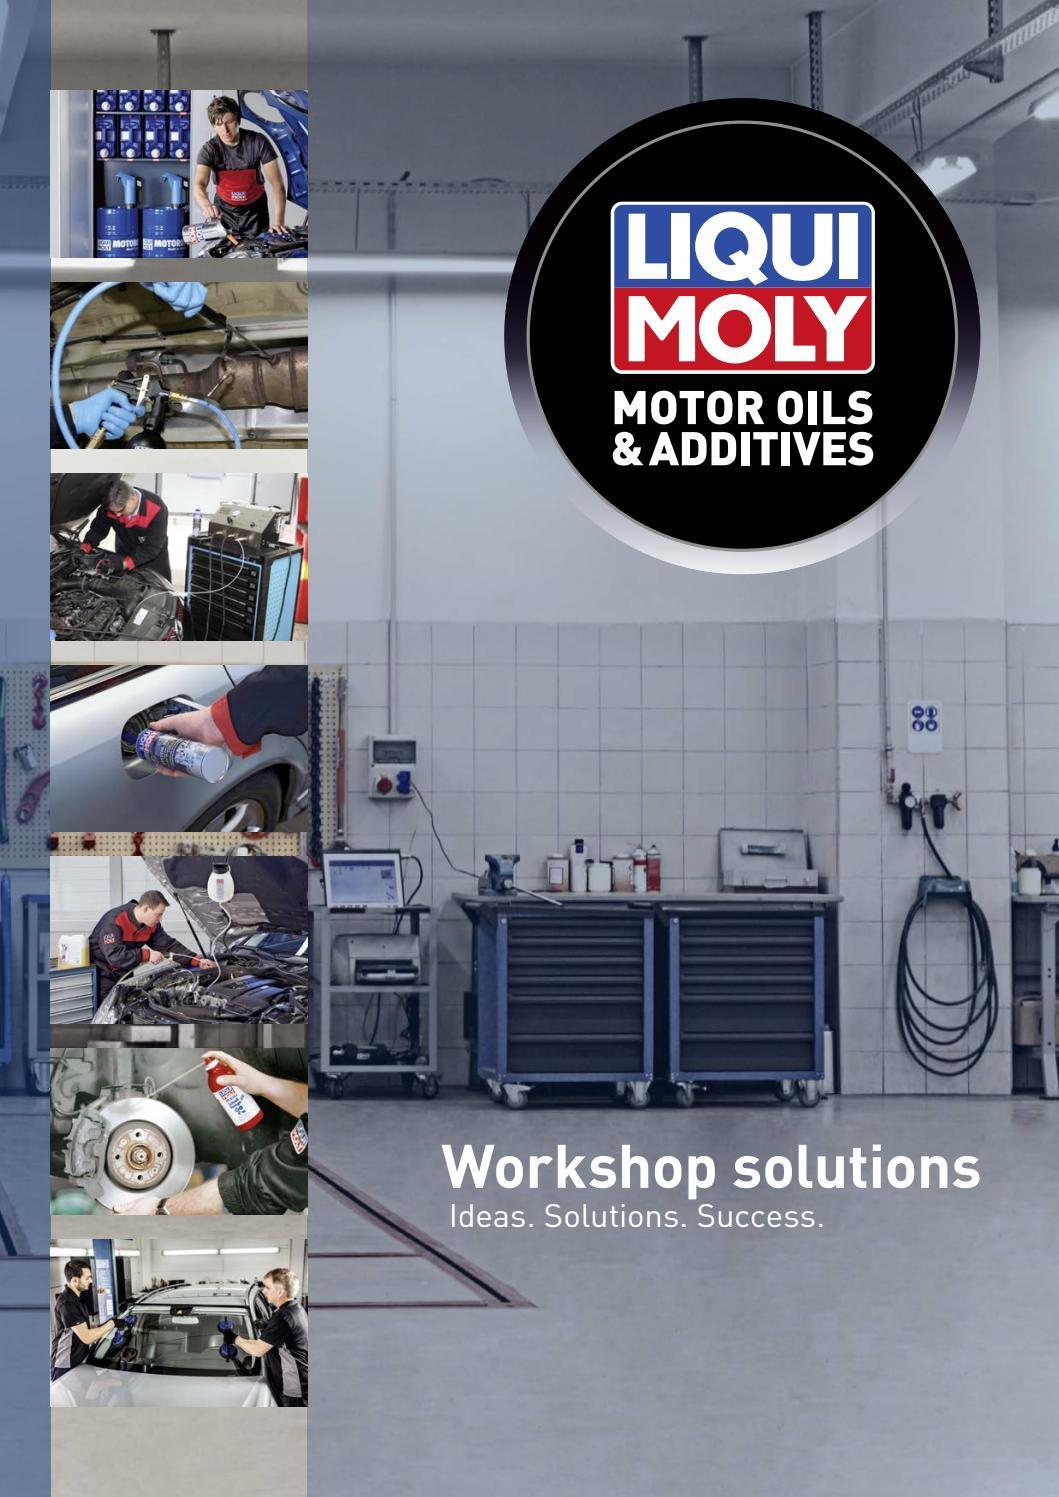 LIQUI MOLY Workshop concepts by LIQUI MOLY GmbH - issuu